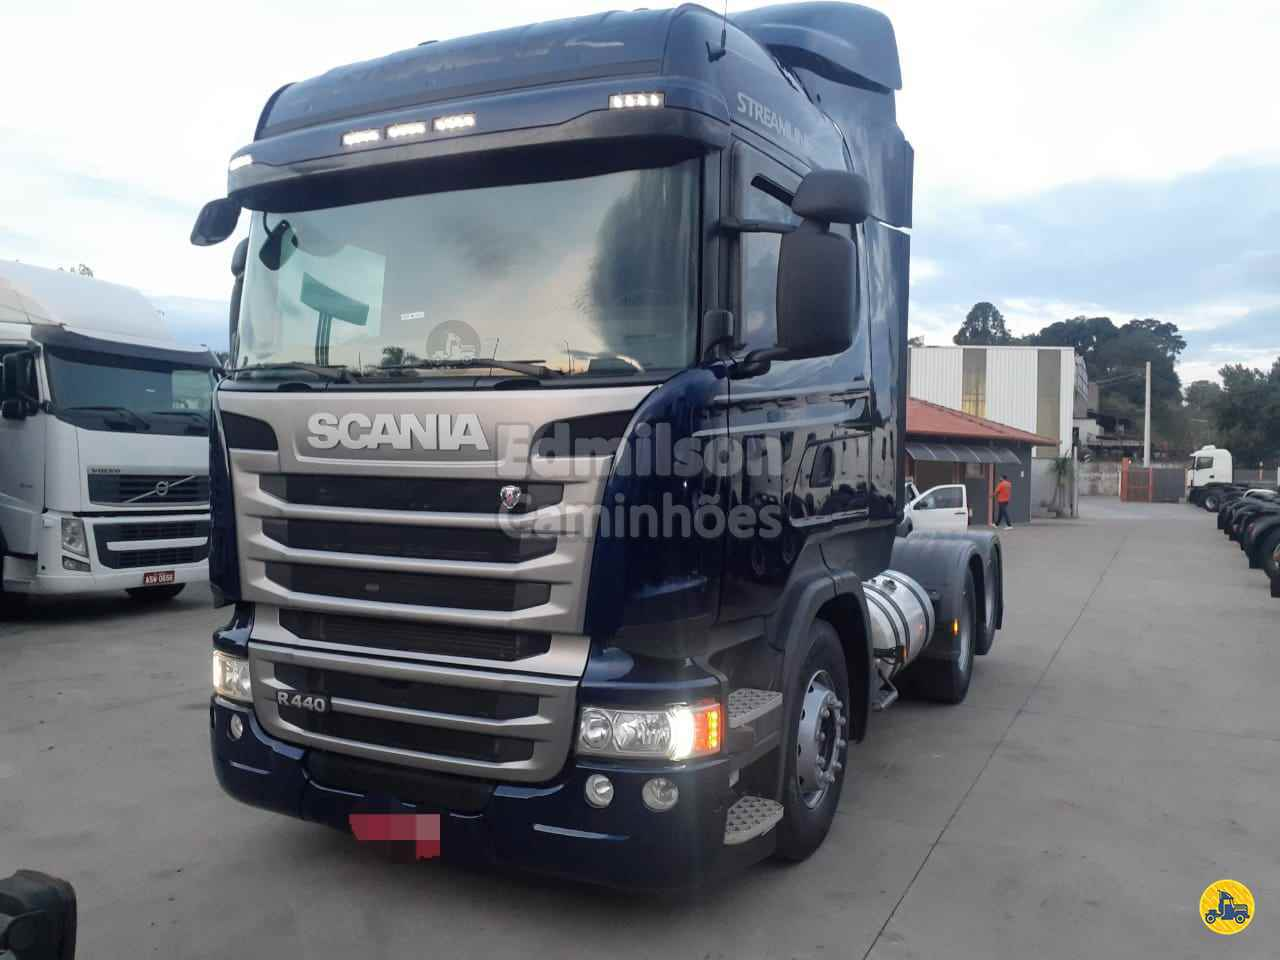 CAMINHAO SCANIA SCANIA 440 Cavalo Mecânico Truck 6x2 Edmilson Caminhões Itajubá MG ITAJUBA MINAS GERAIS MG